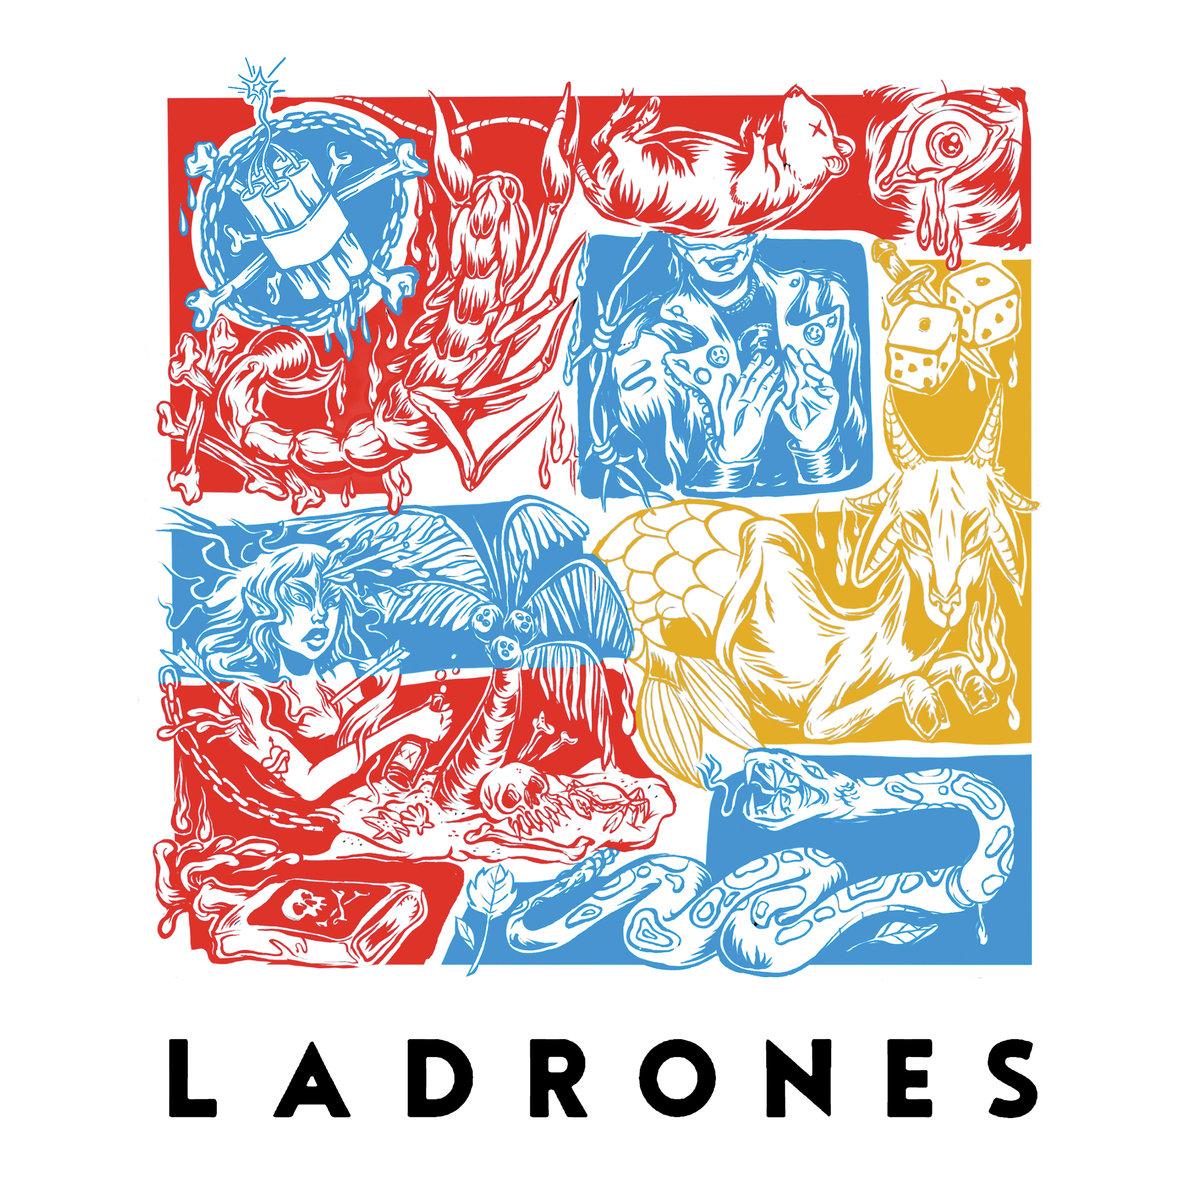 Ladrones - Ladrones 1 - fanzine